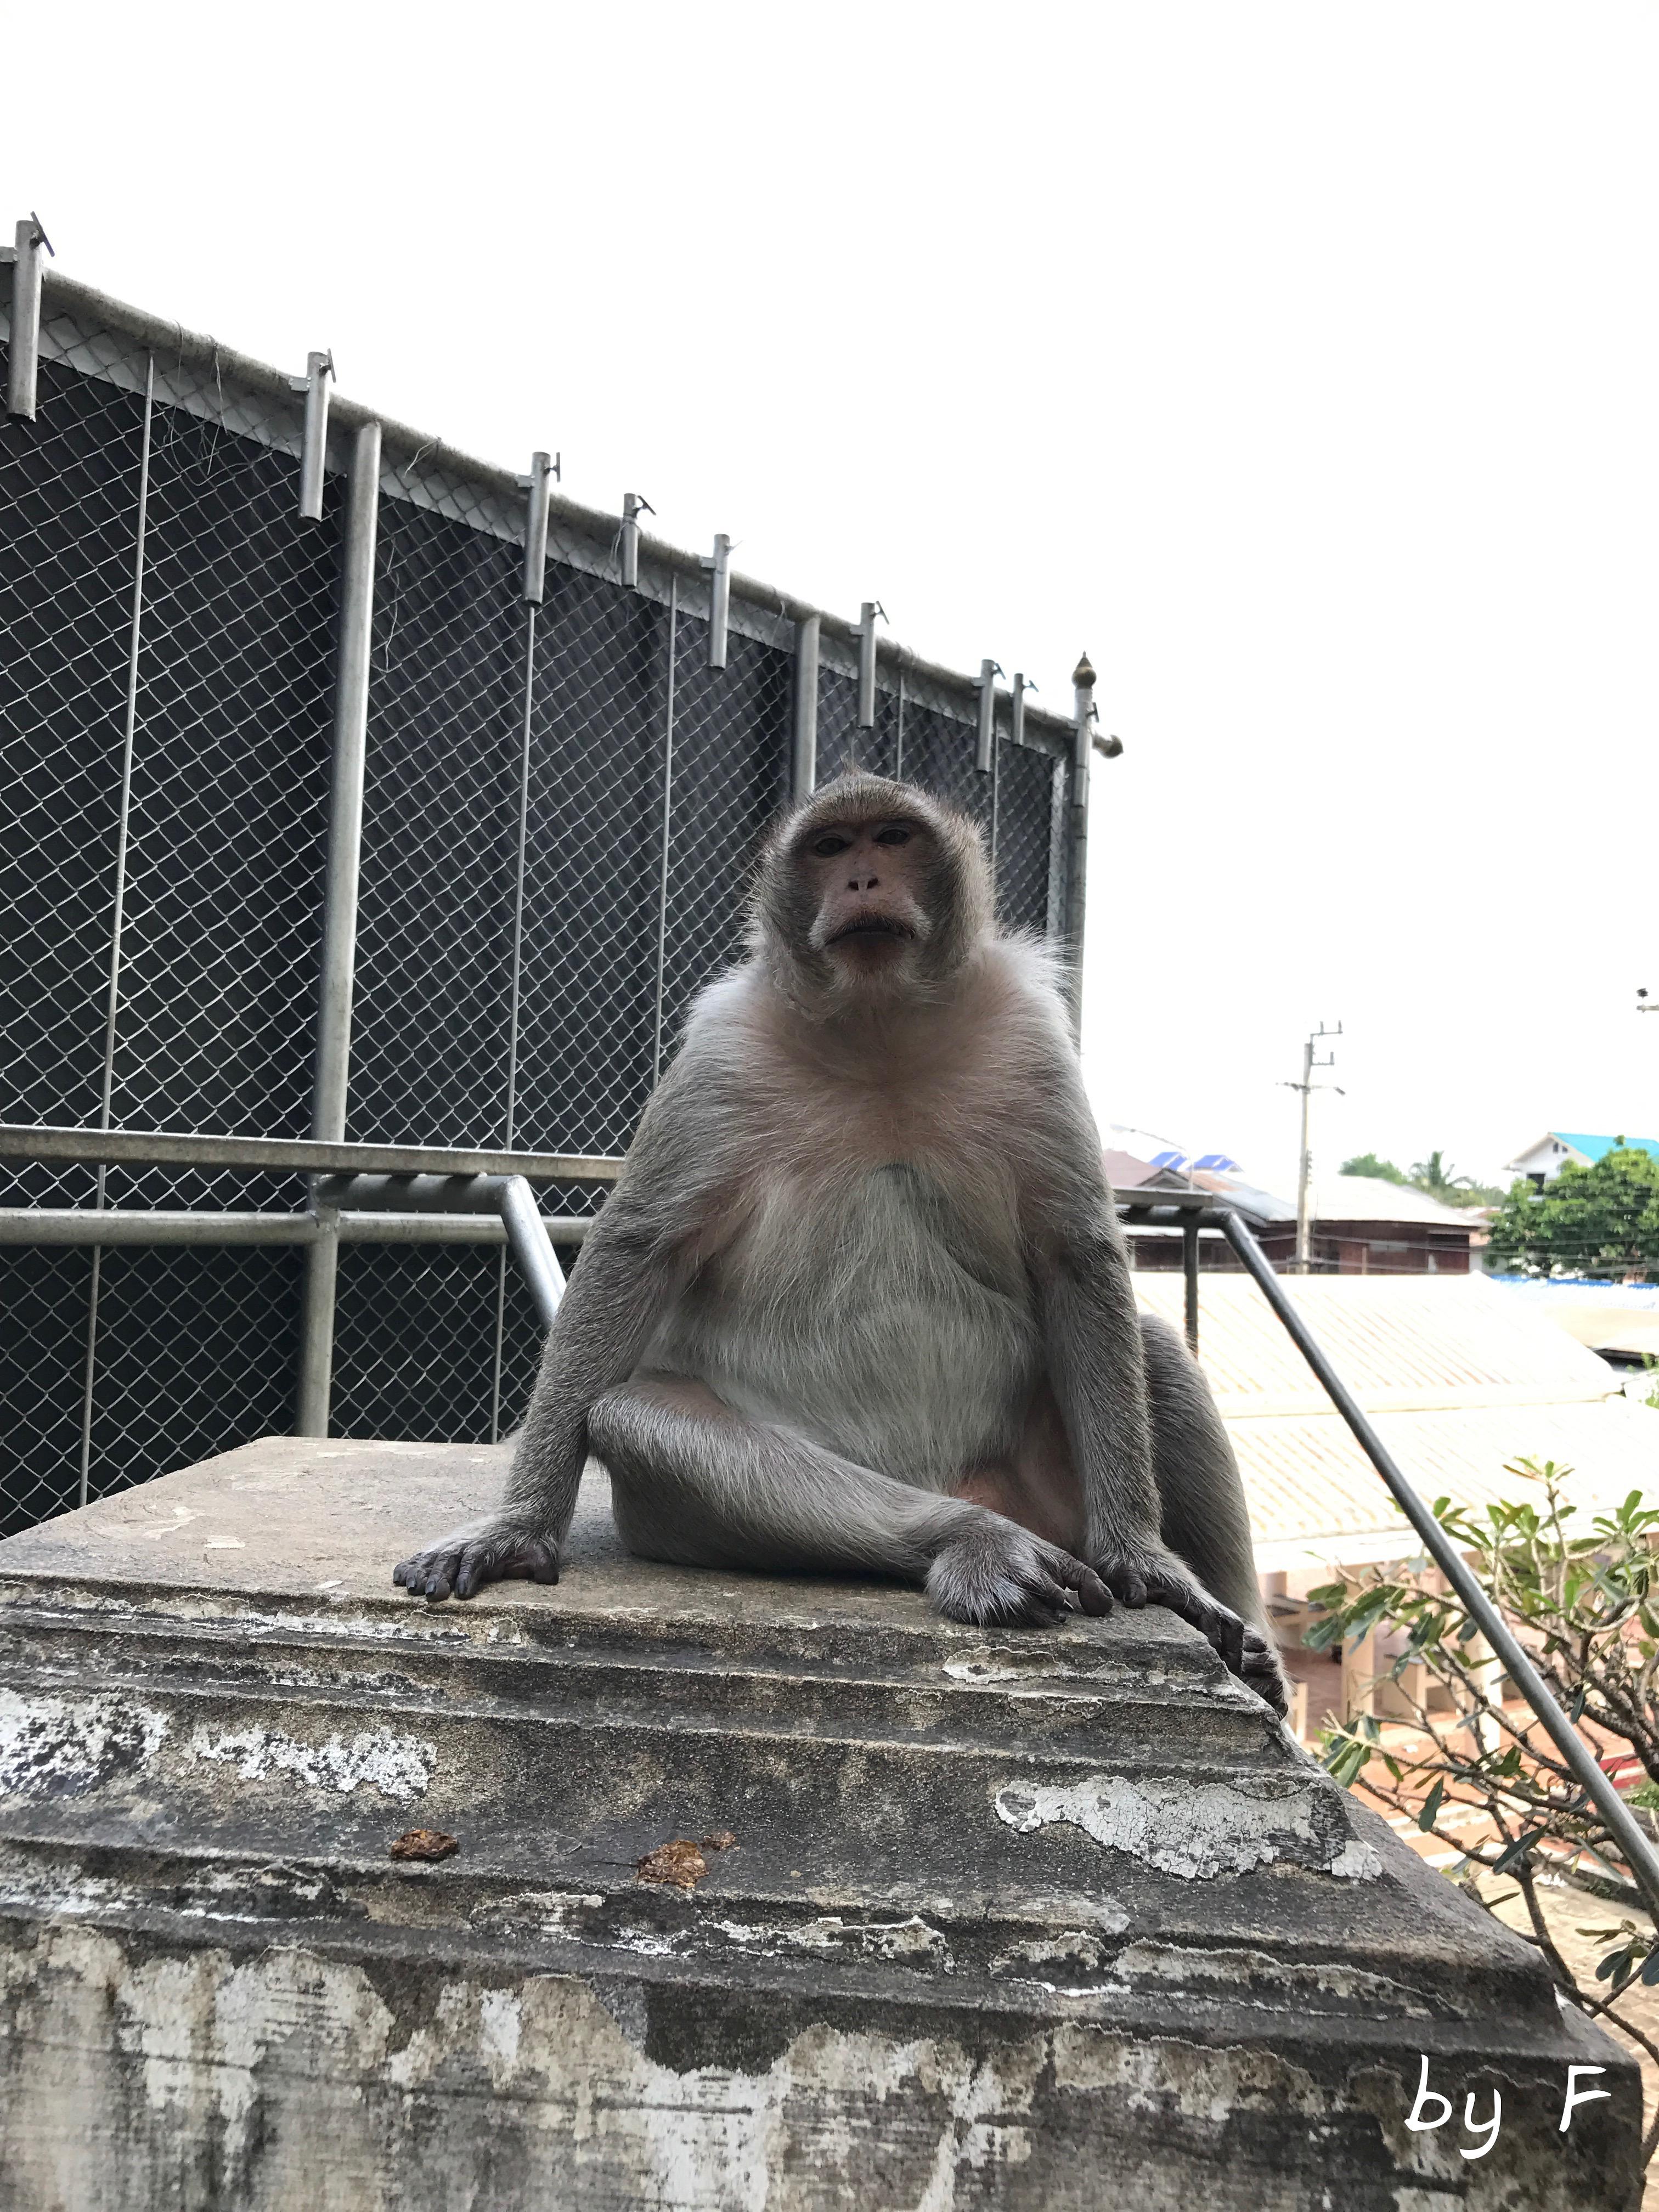 Singe Petchaburi Thaïlande Asie